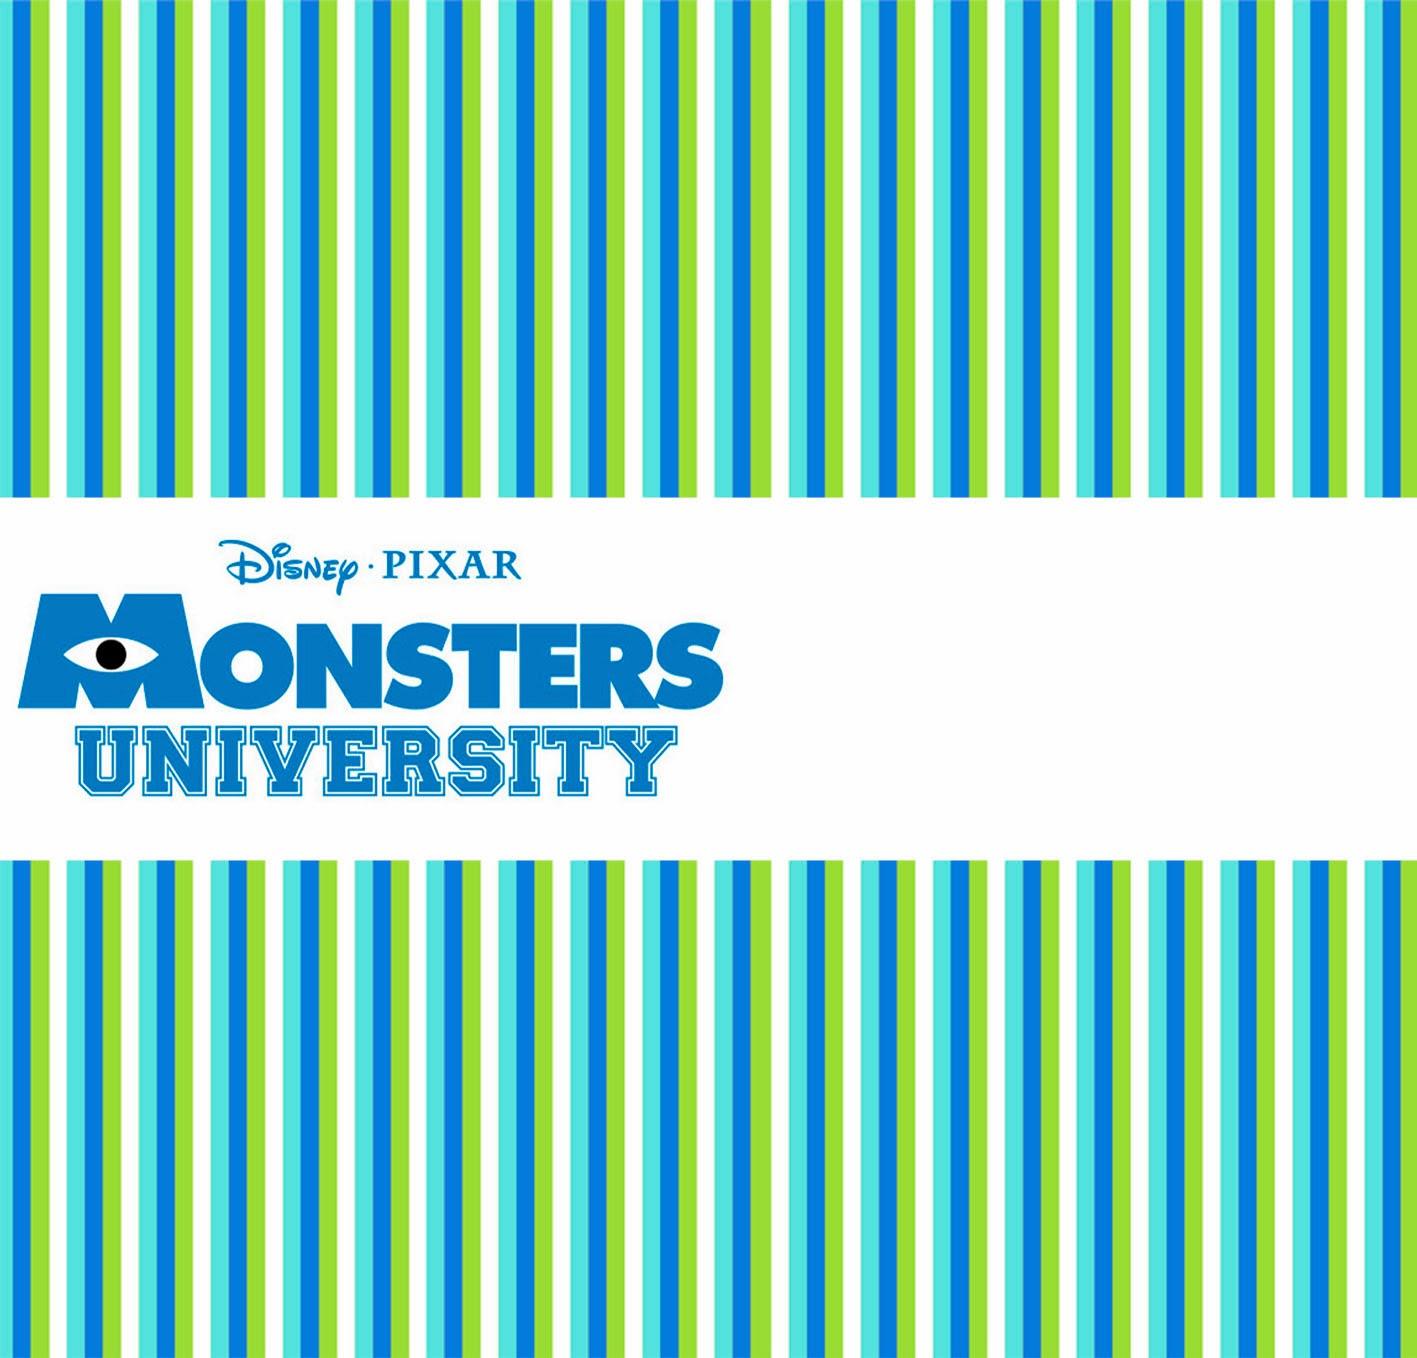 Tarjeta o Invitación de Monster University.